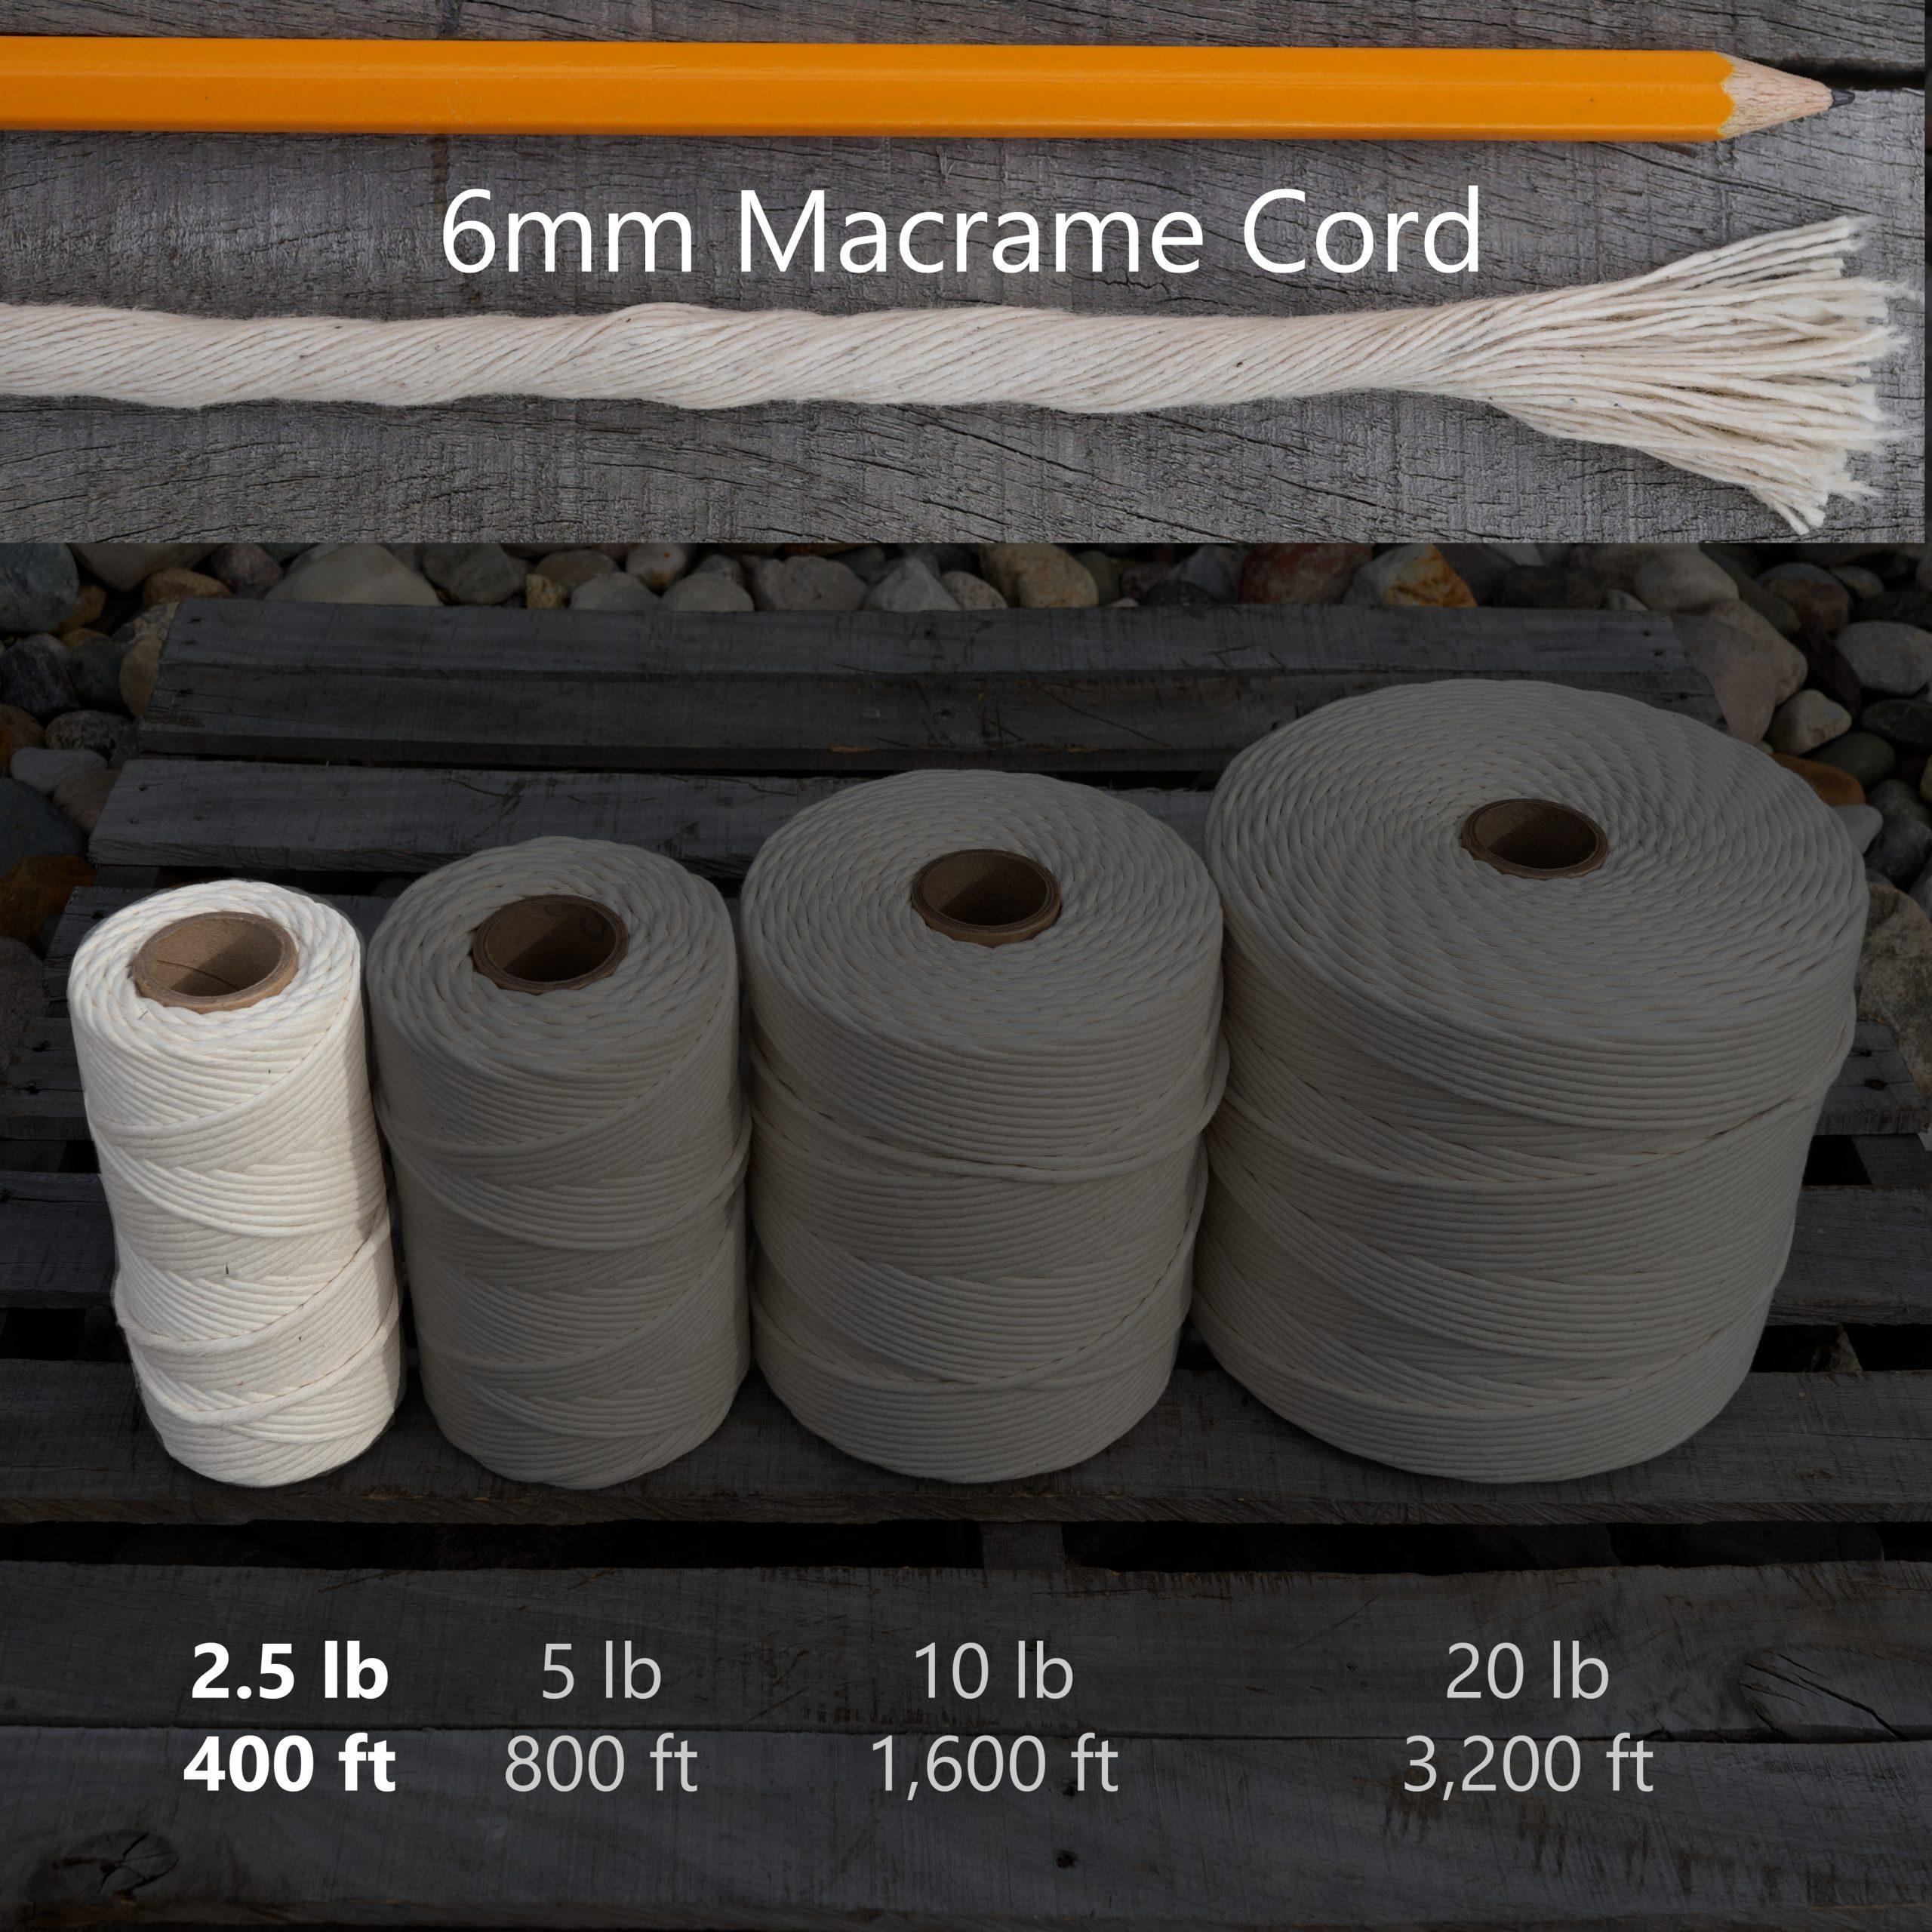 6 mm x 2.5 lb tube